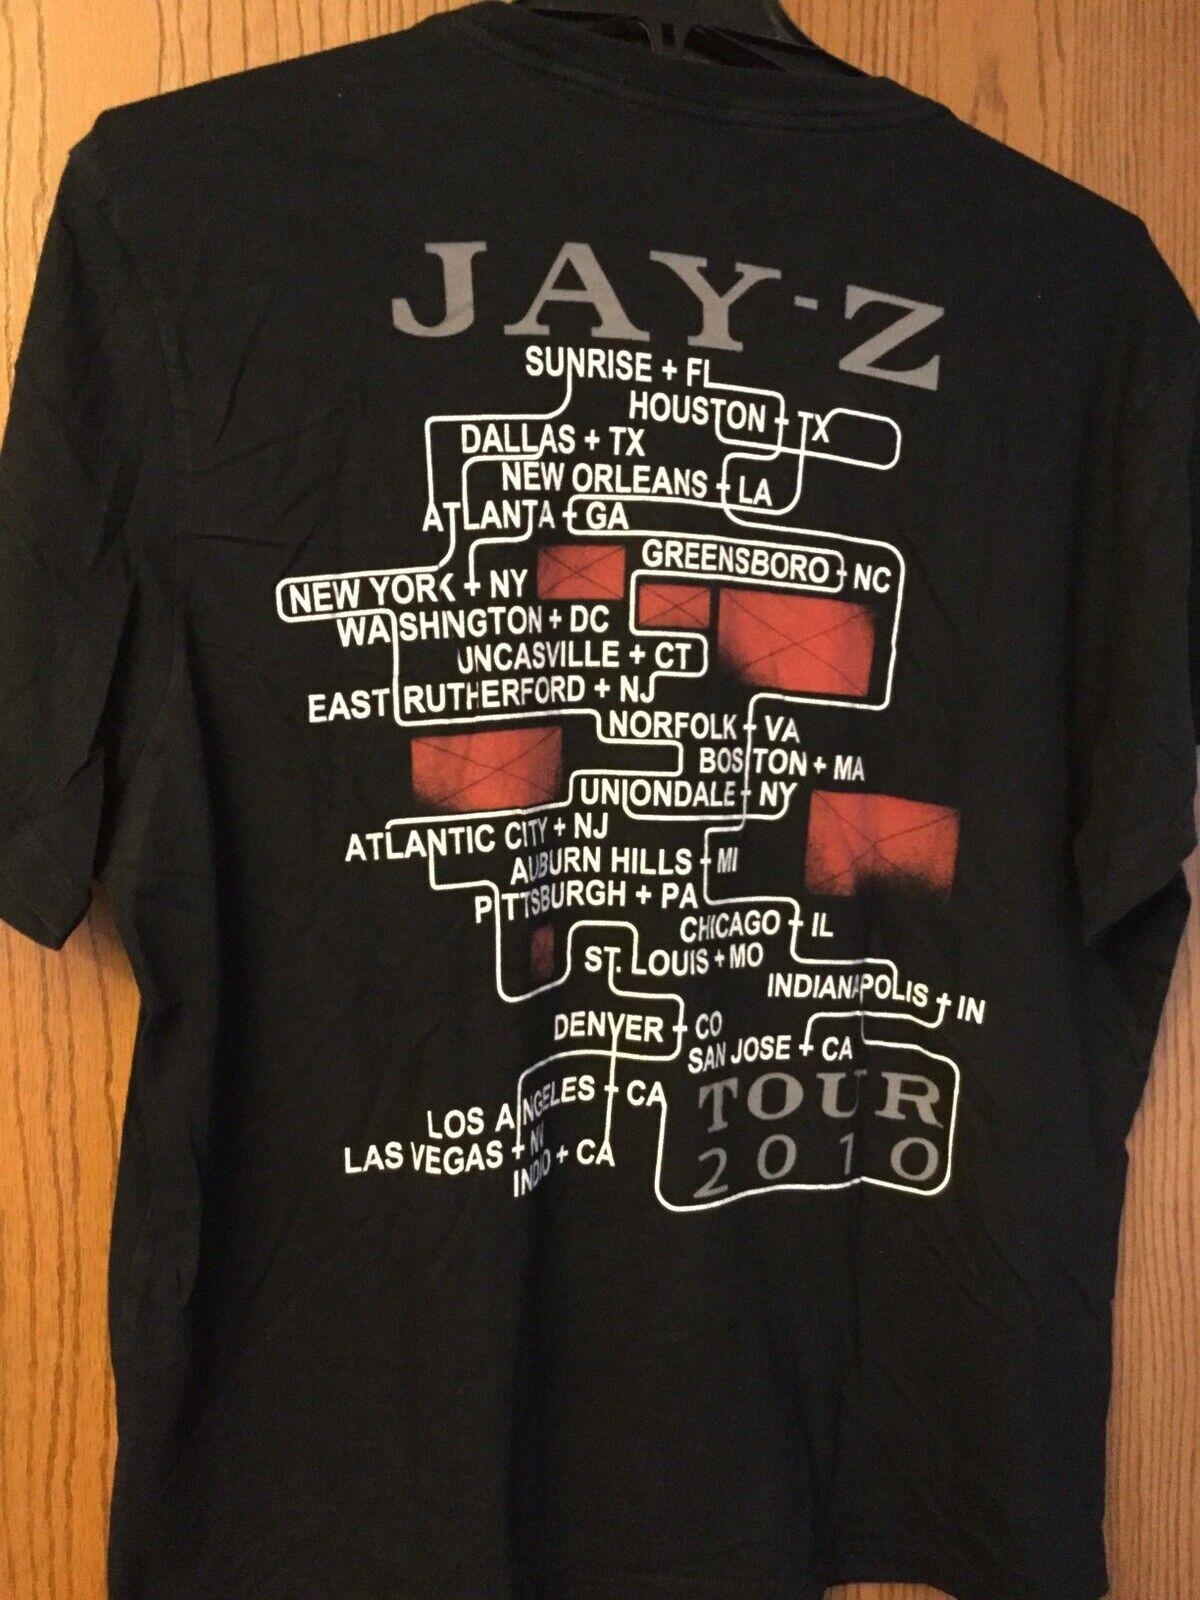 Jay Z - Tour 2010 Black Shirt.   XXL. - image 2